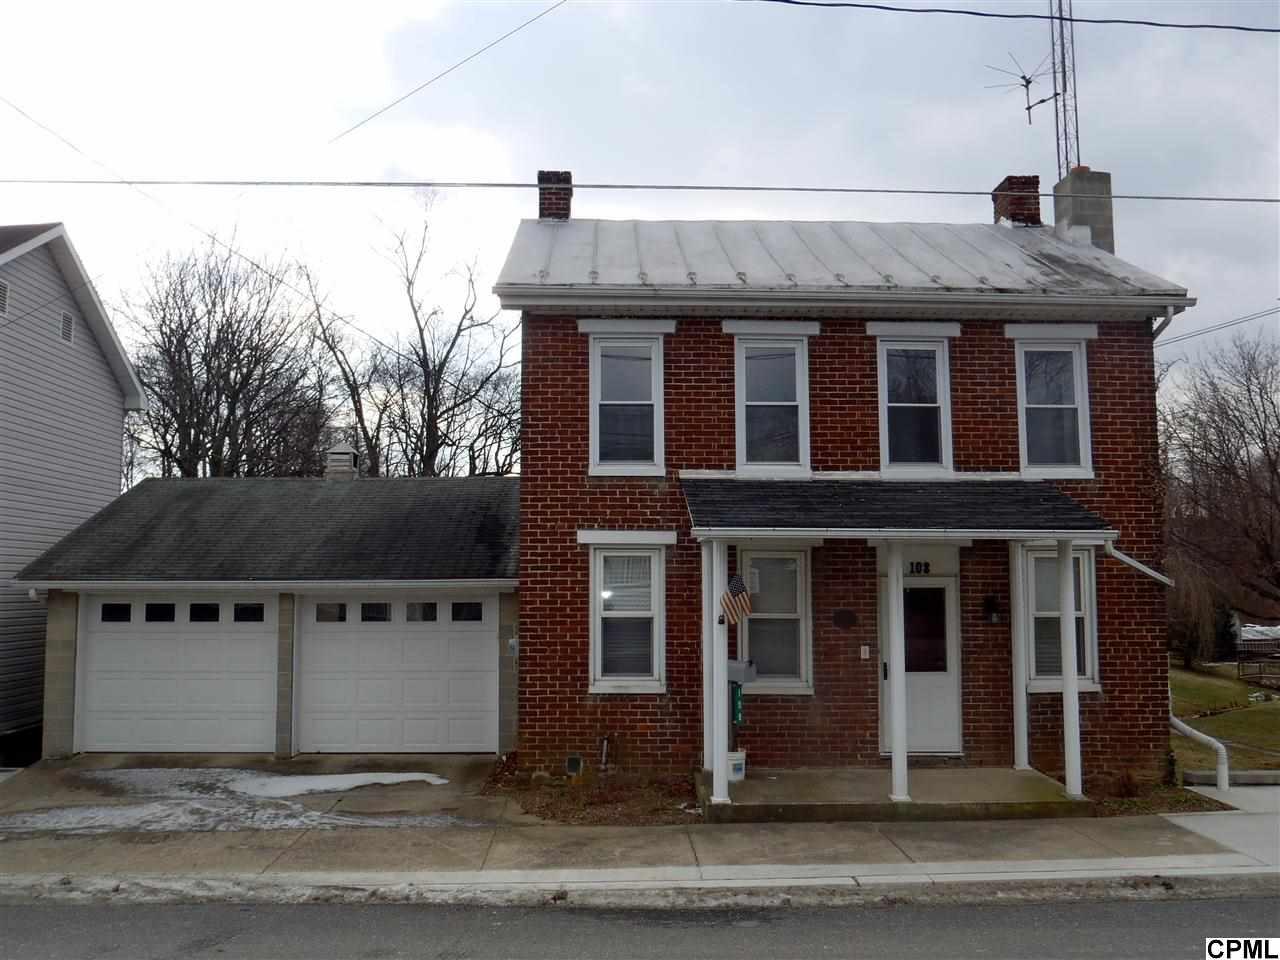 Real Estate for Sale, ListingId: 31373930, Newburg,PA17240